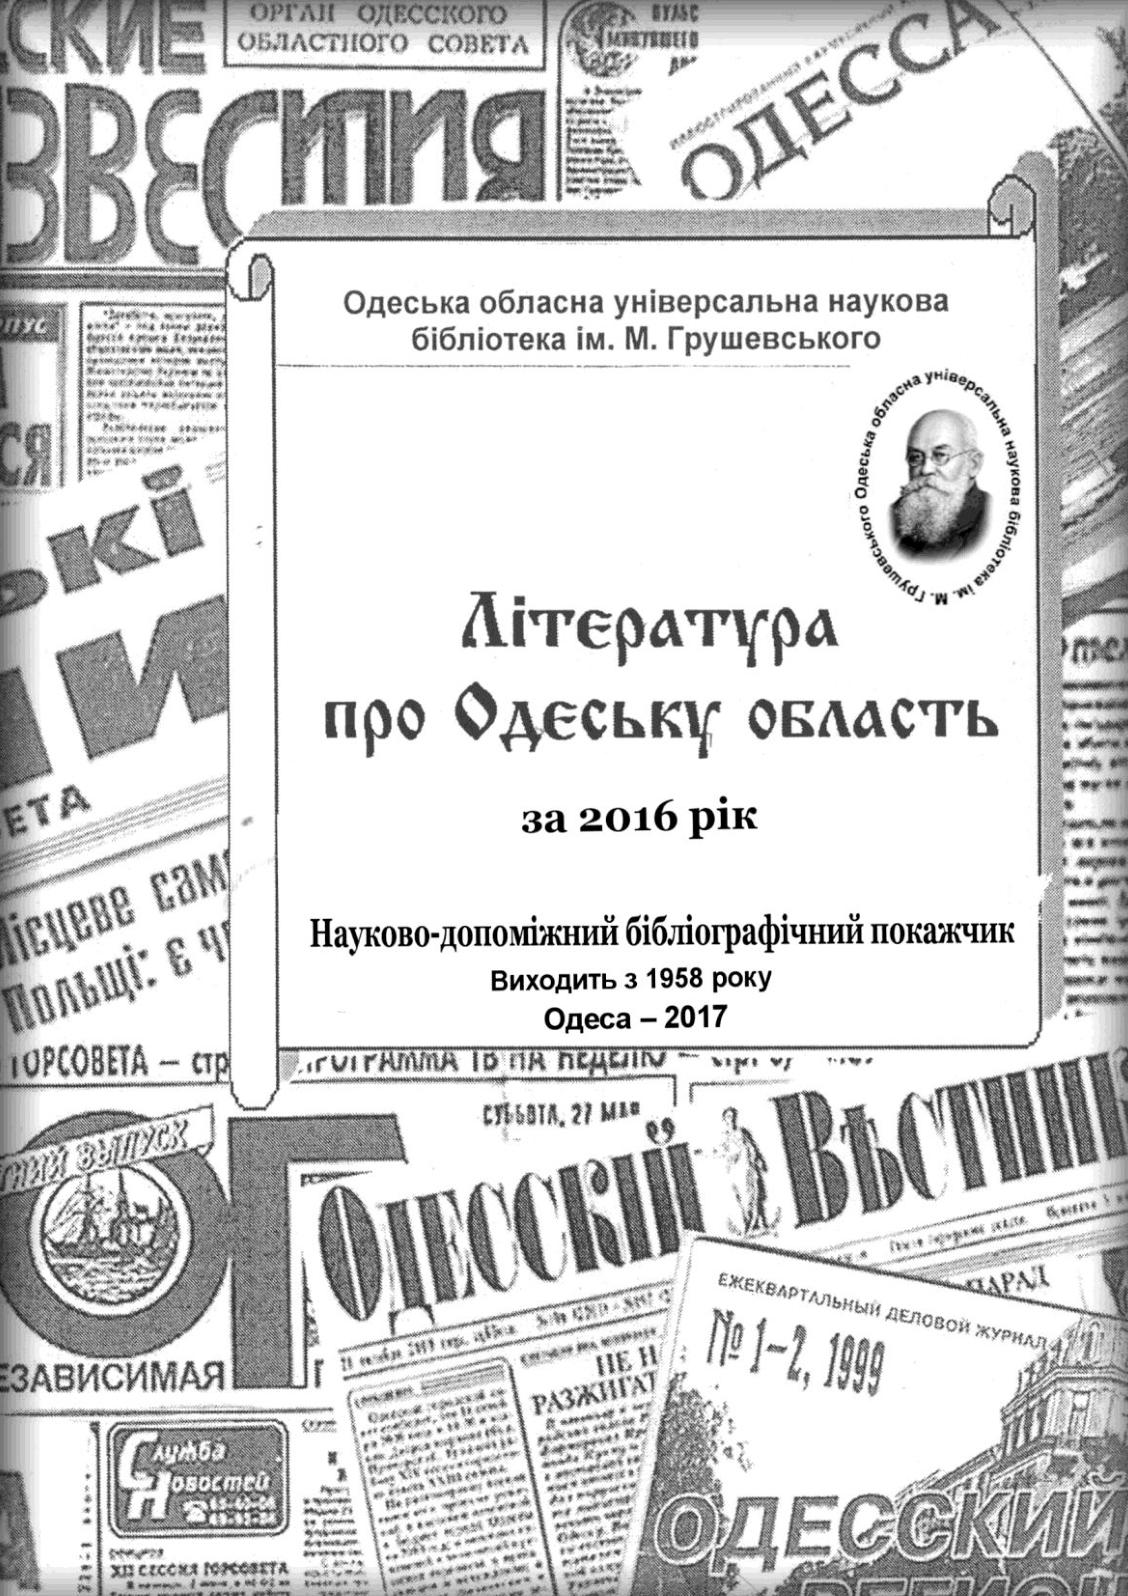 Calaméo - Література про Одеську область за 2016 рік 2e8881c0f6e4b